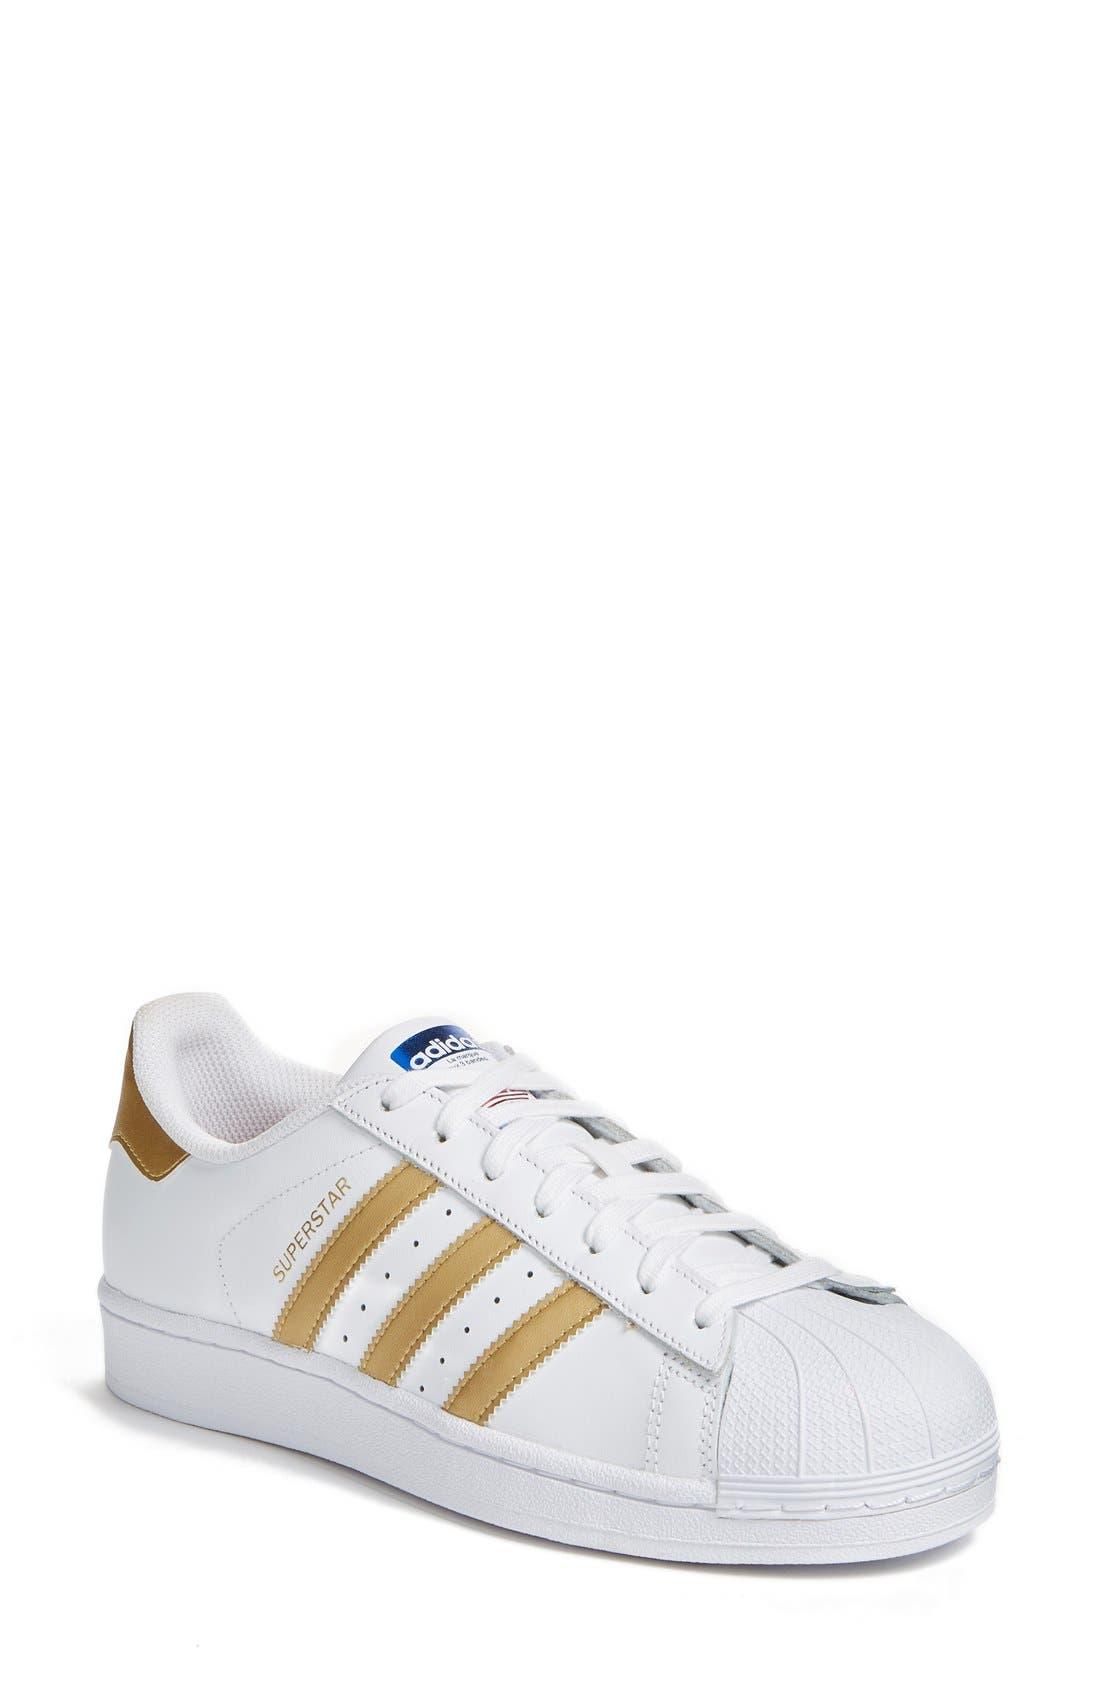 adidas Superstar Sneaker